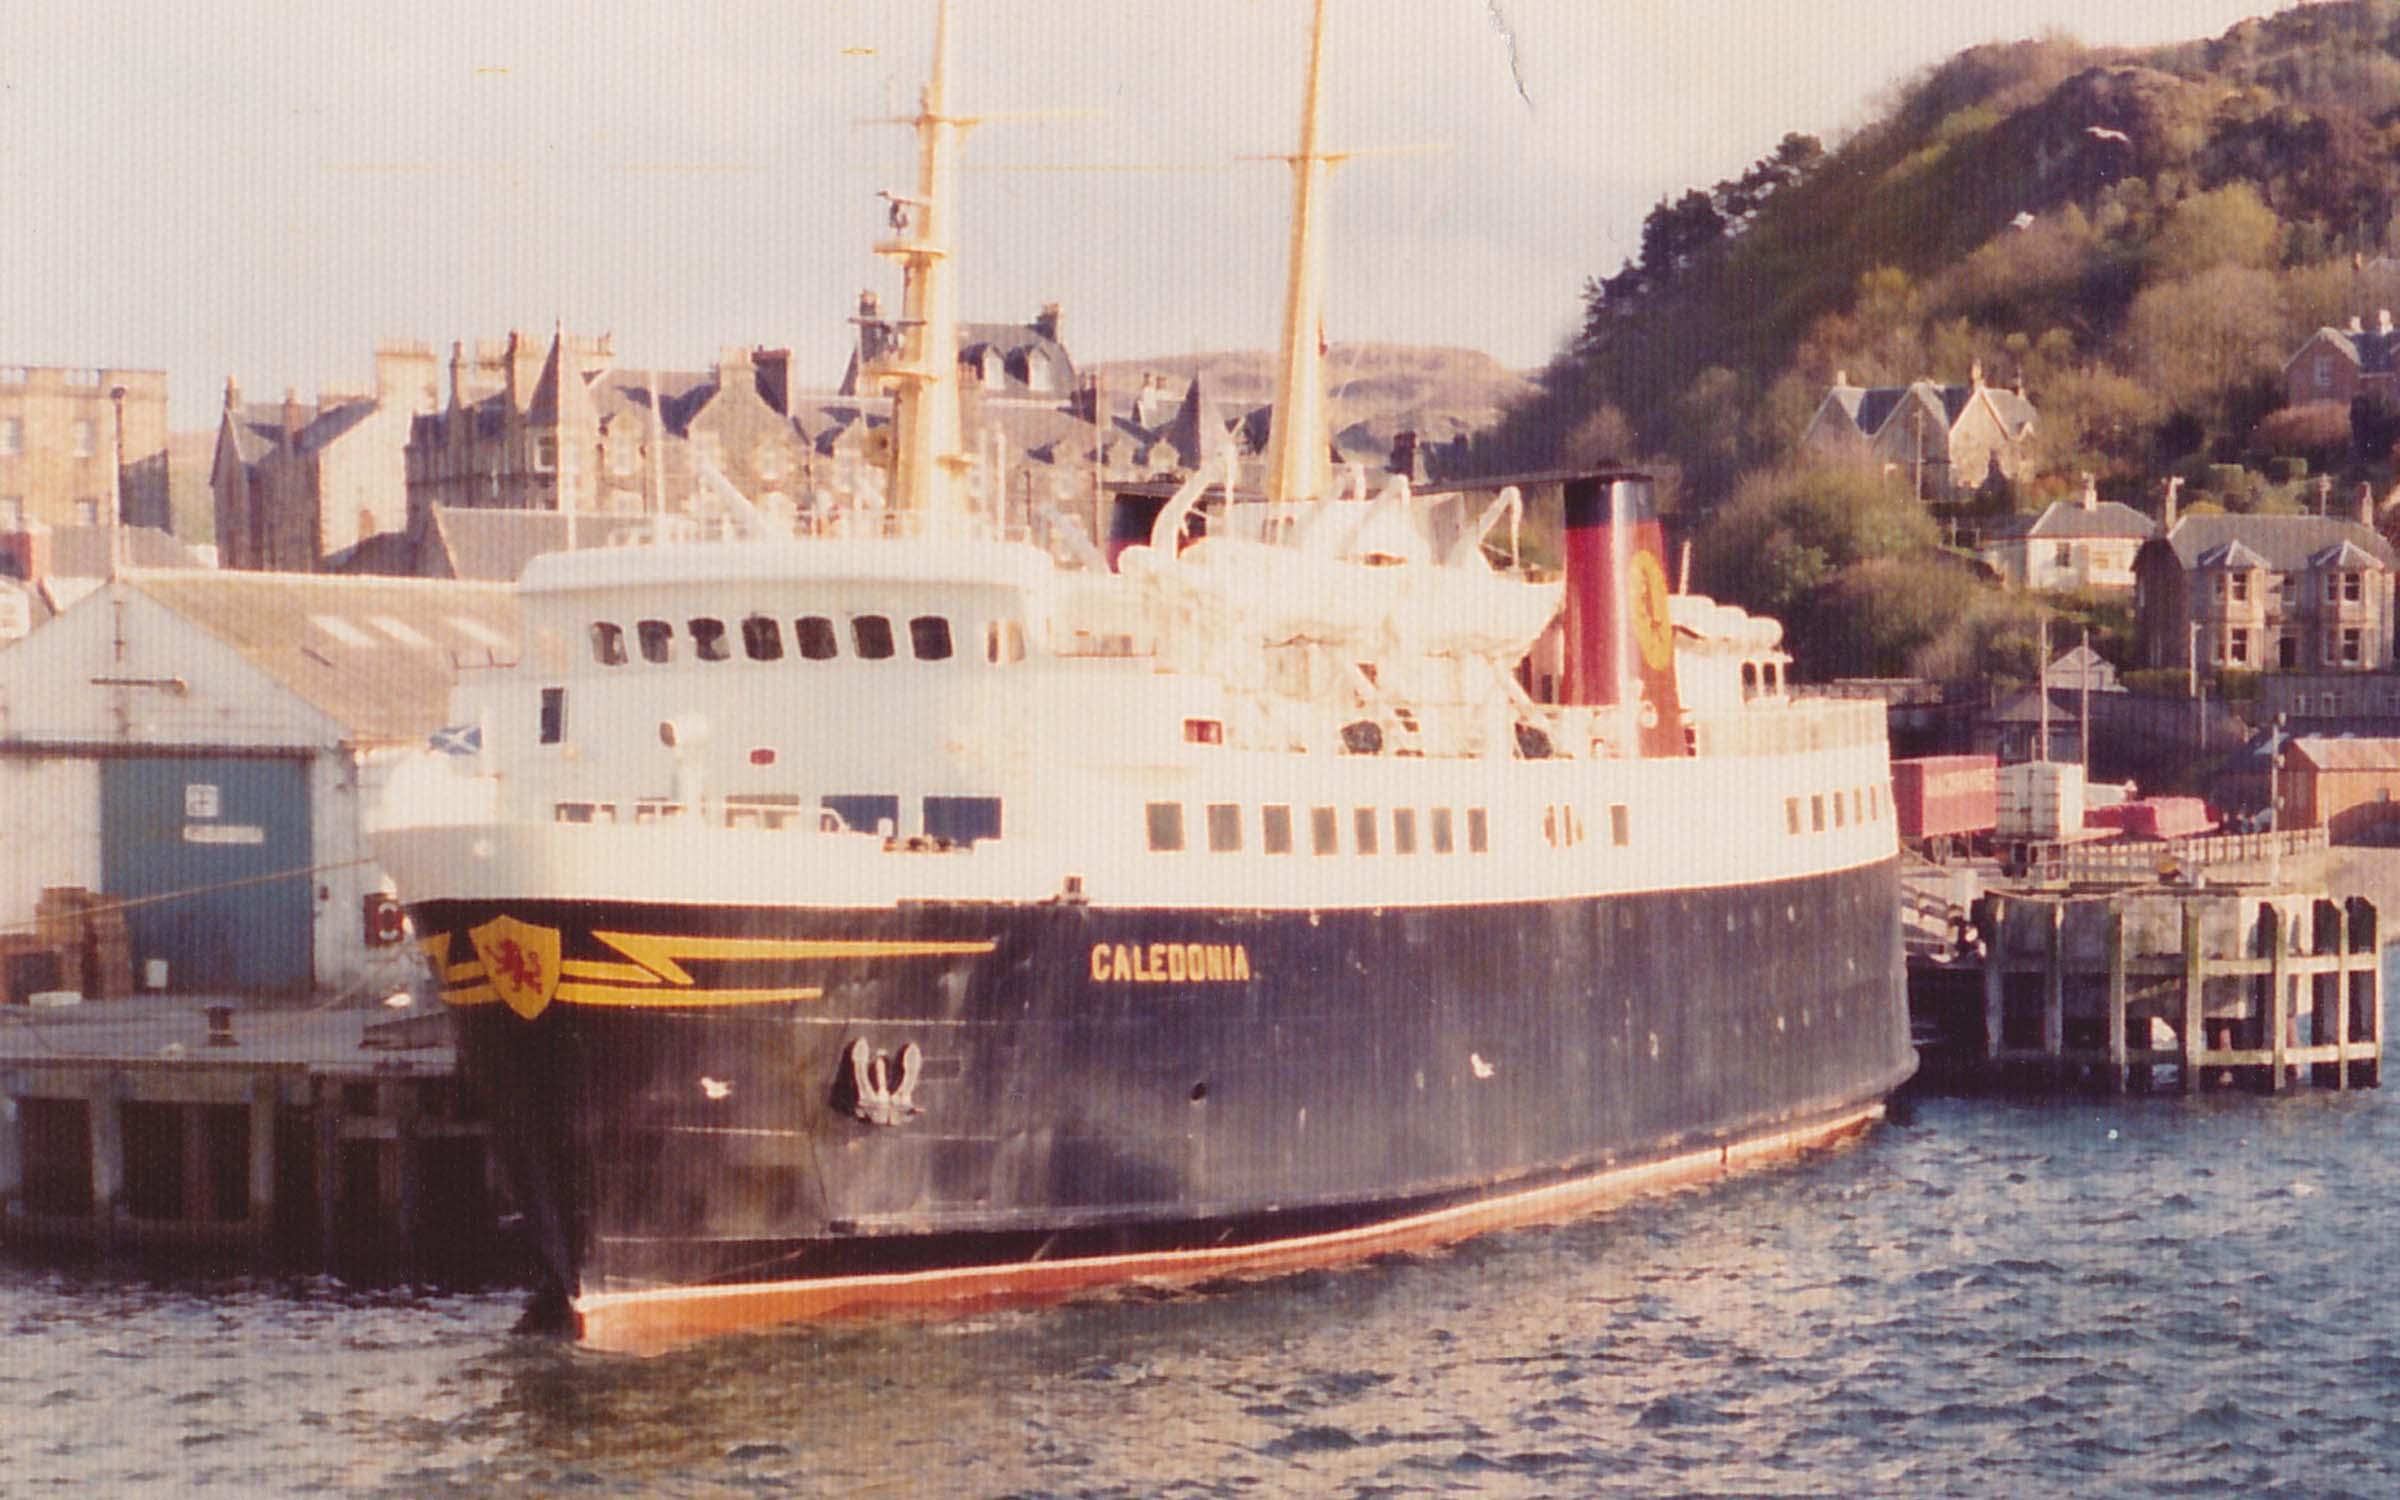 Caledonia at Oban linkspan (Ships of CalMac)